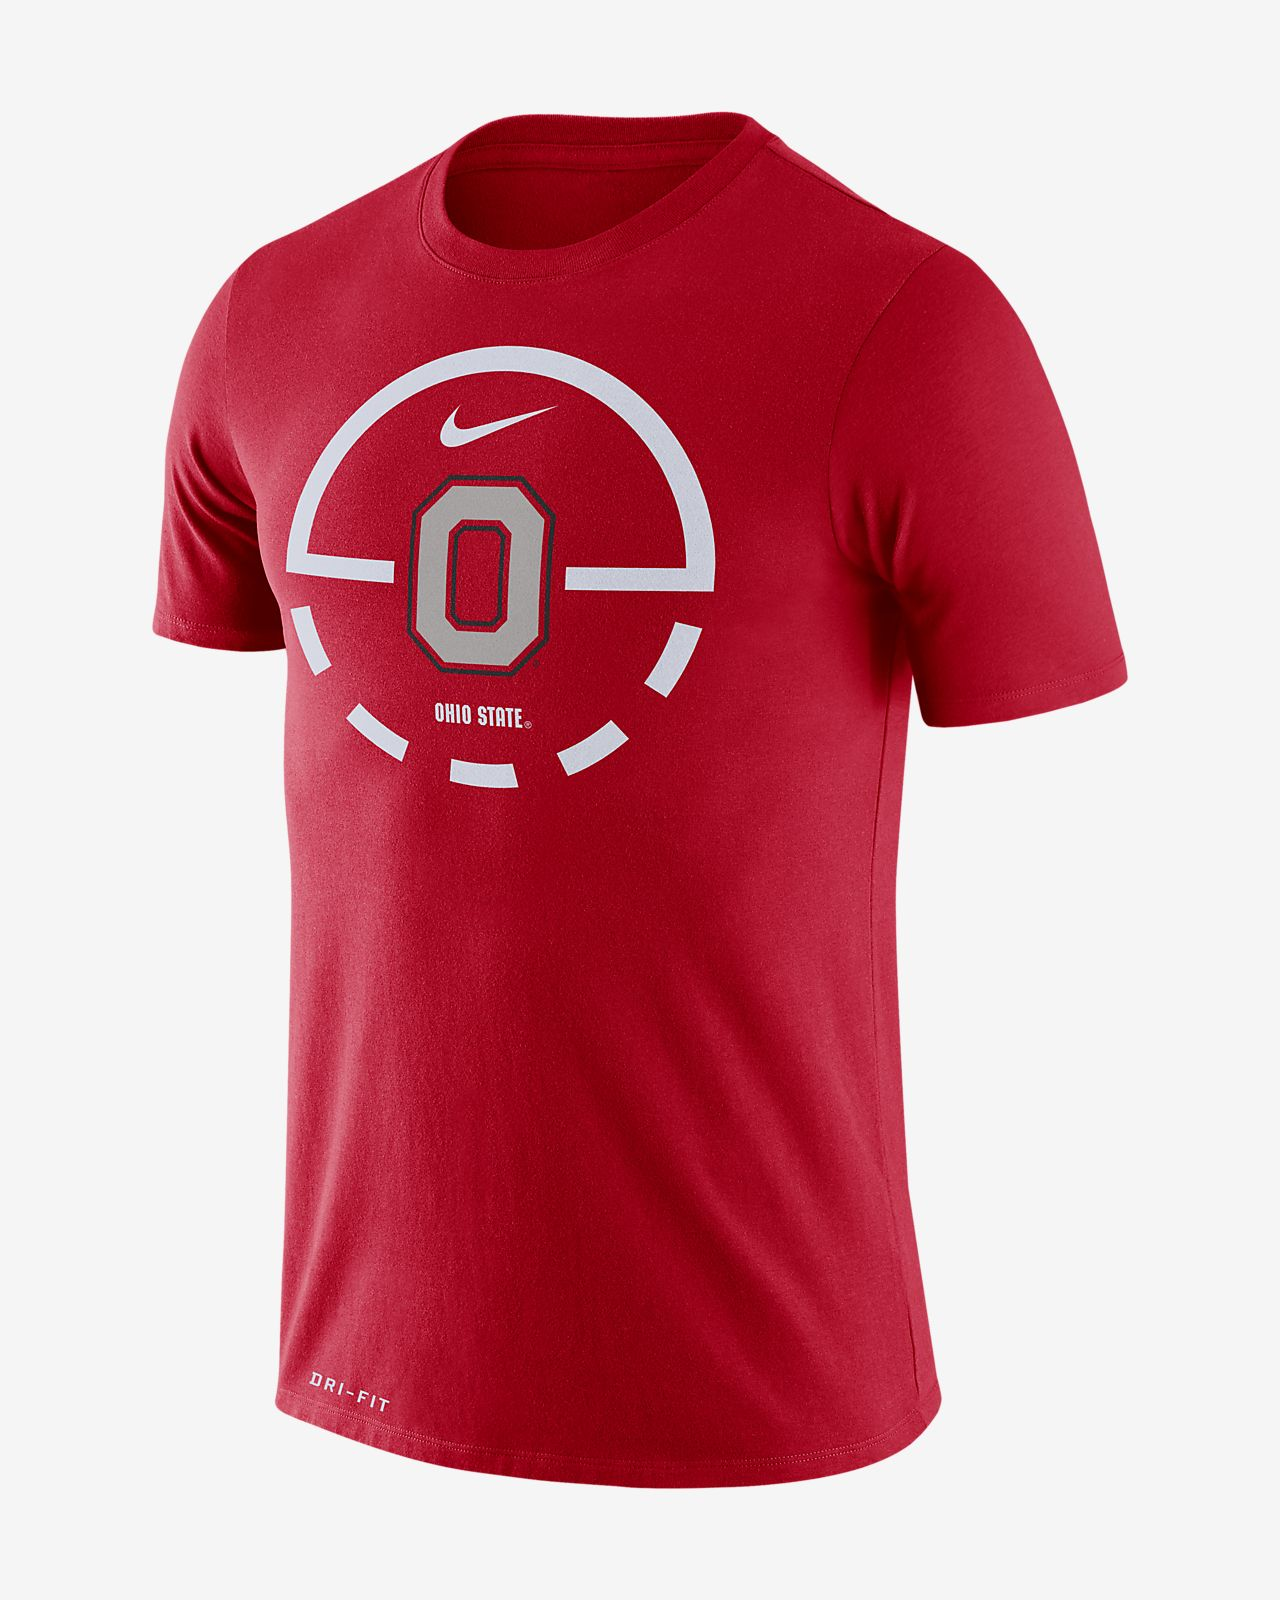 Nike College Dri-FIT Legend 2.0 (Ohio State) Men's T-Shirt